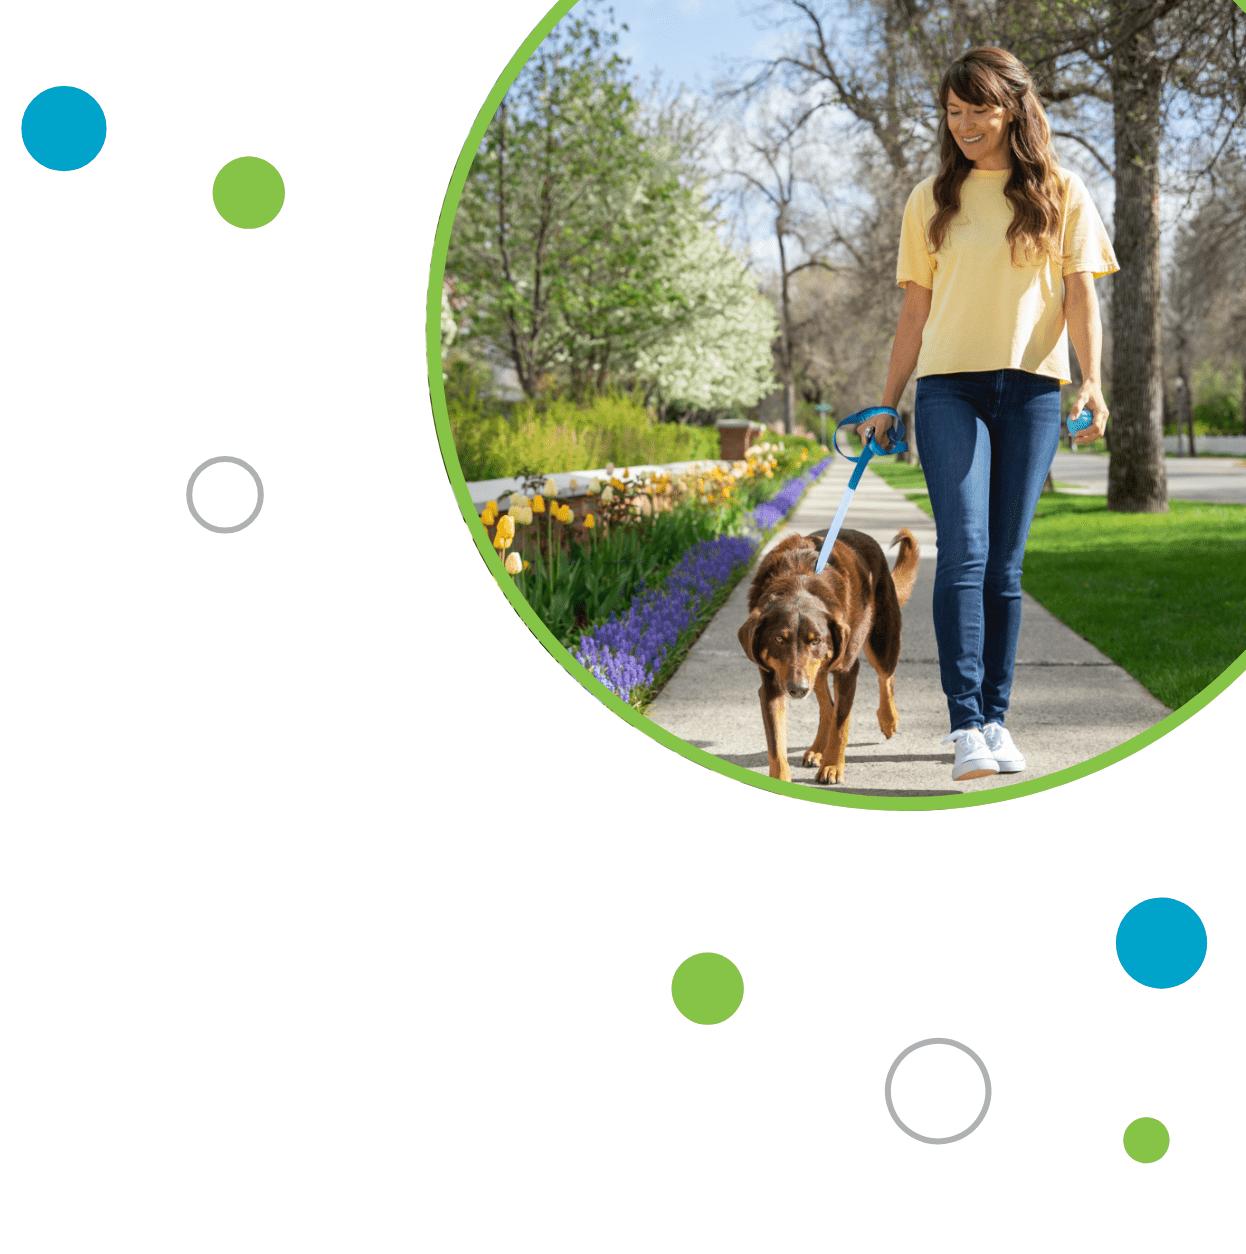 Portrait of woman walking her dog